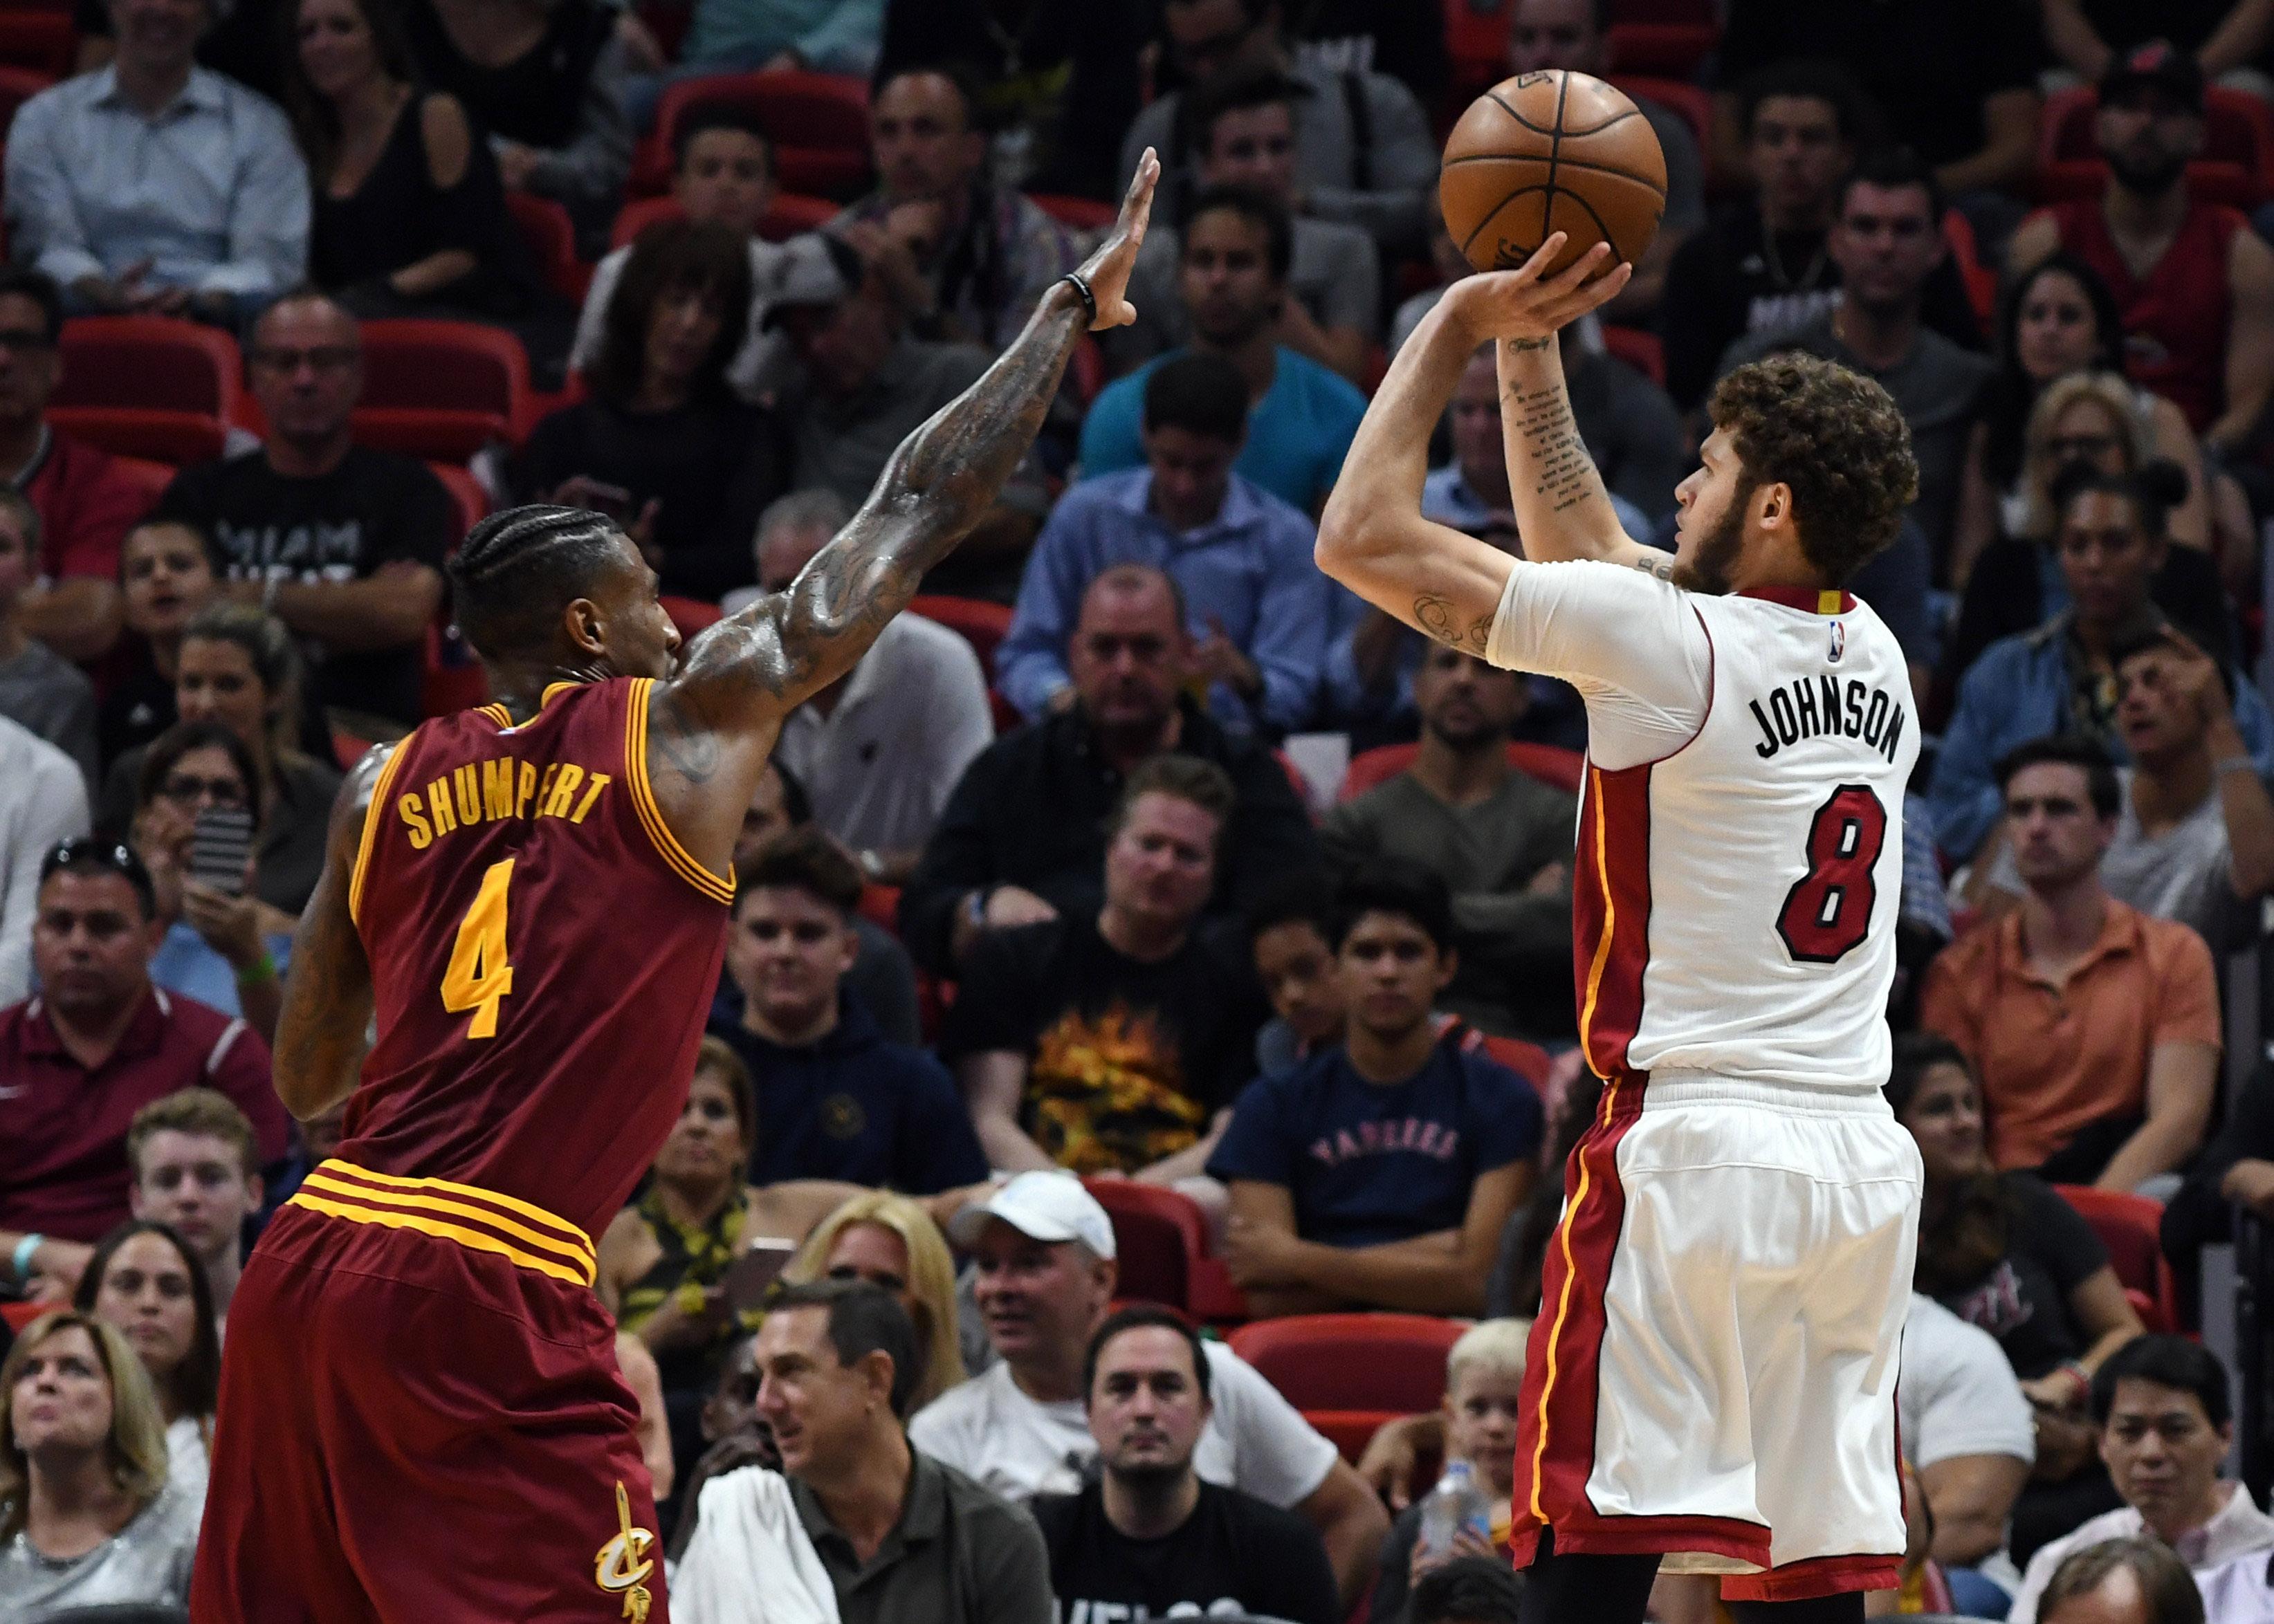 Miami heat roster nba - Miami Heat 2017 Roster 10005297 Nba Cleveland Cavaliers At Miami Heat Miami Heat Roster Latest